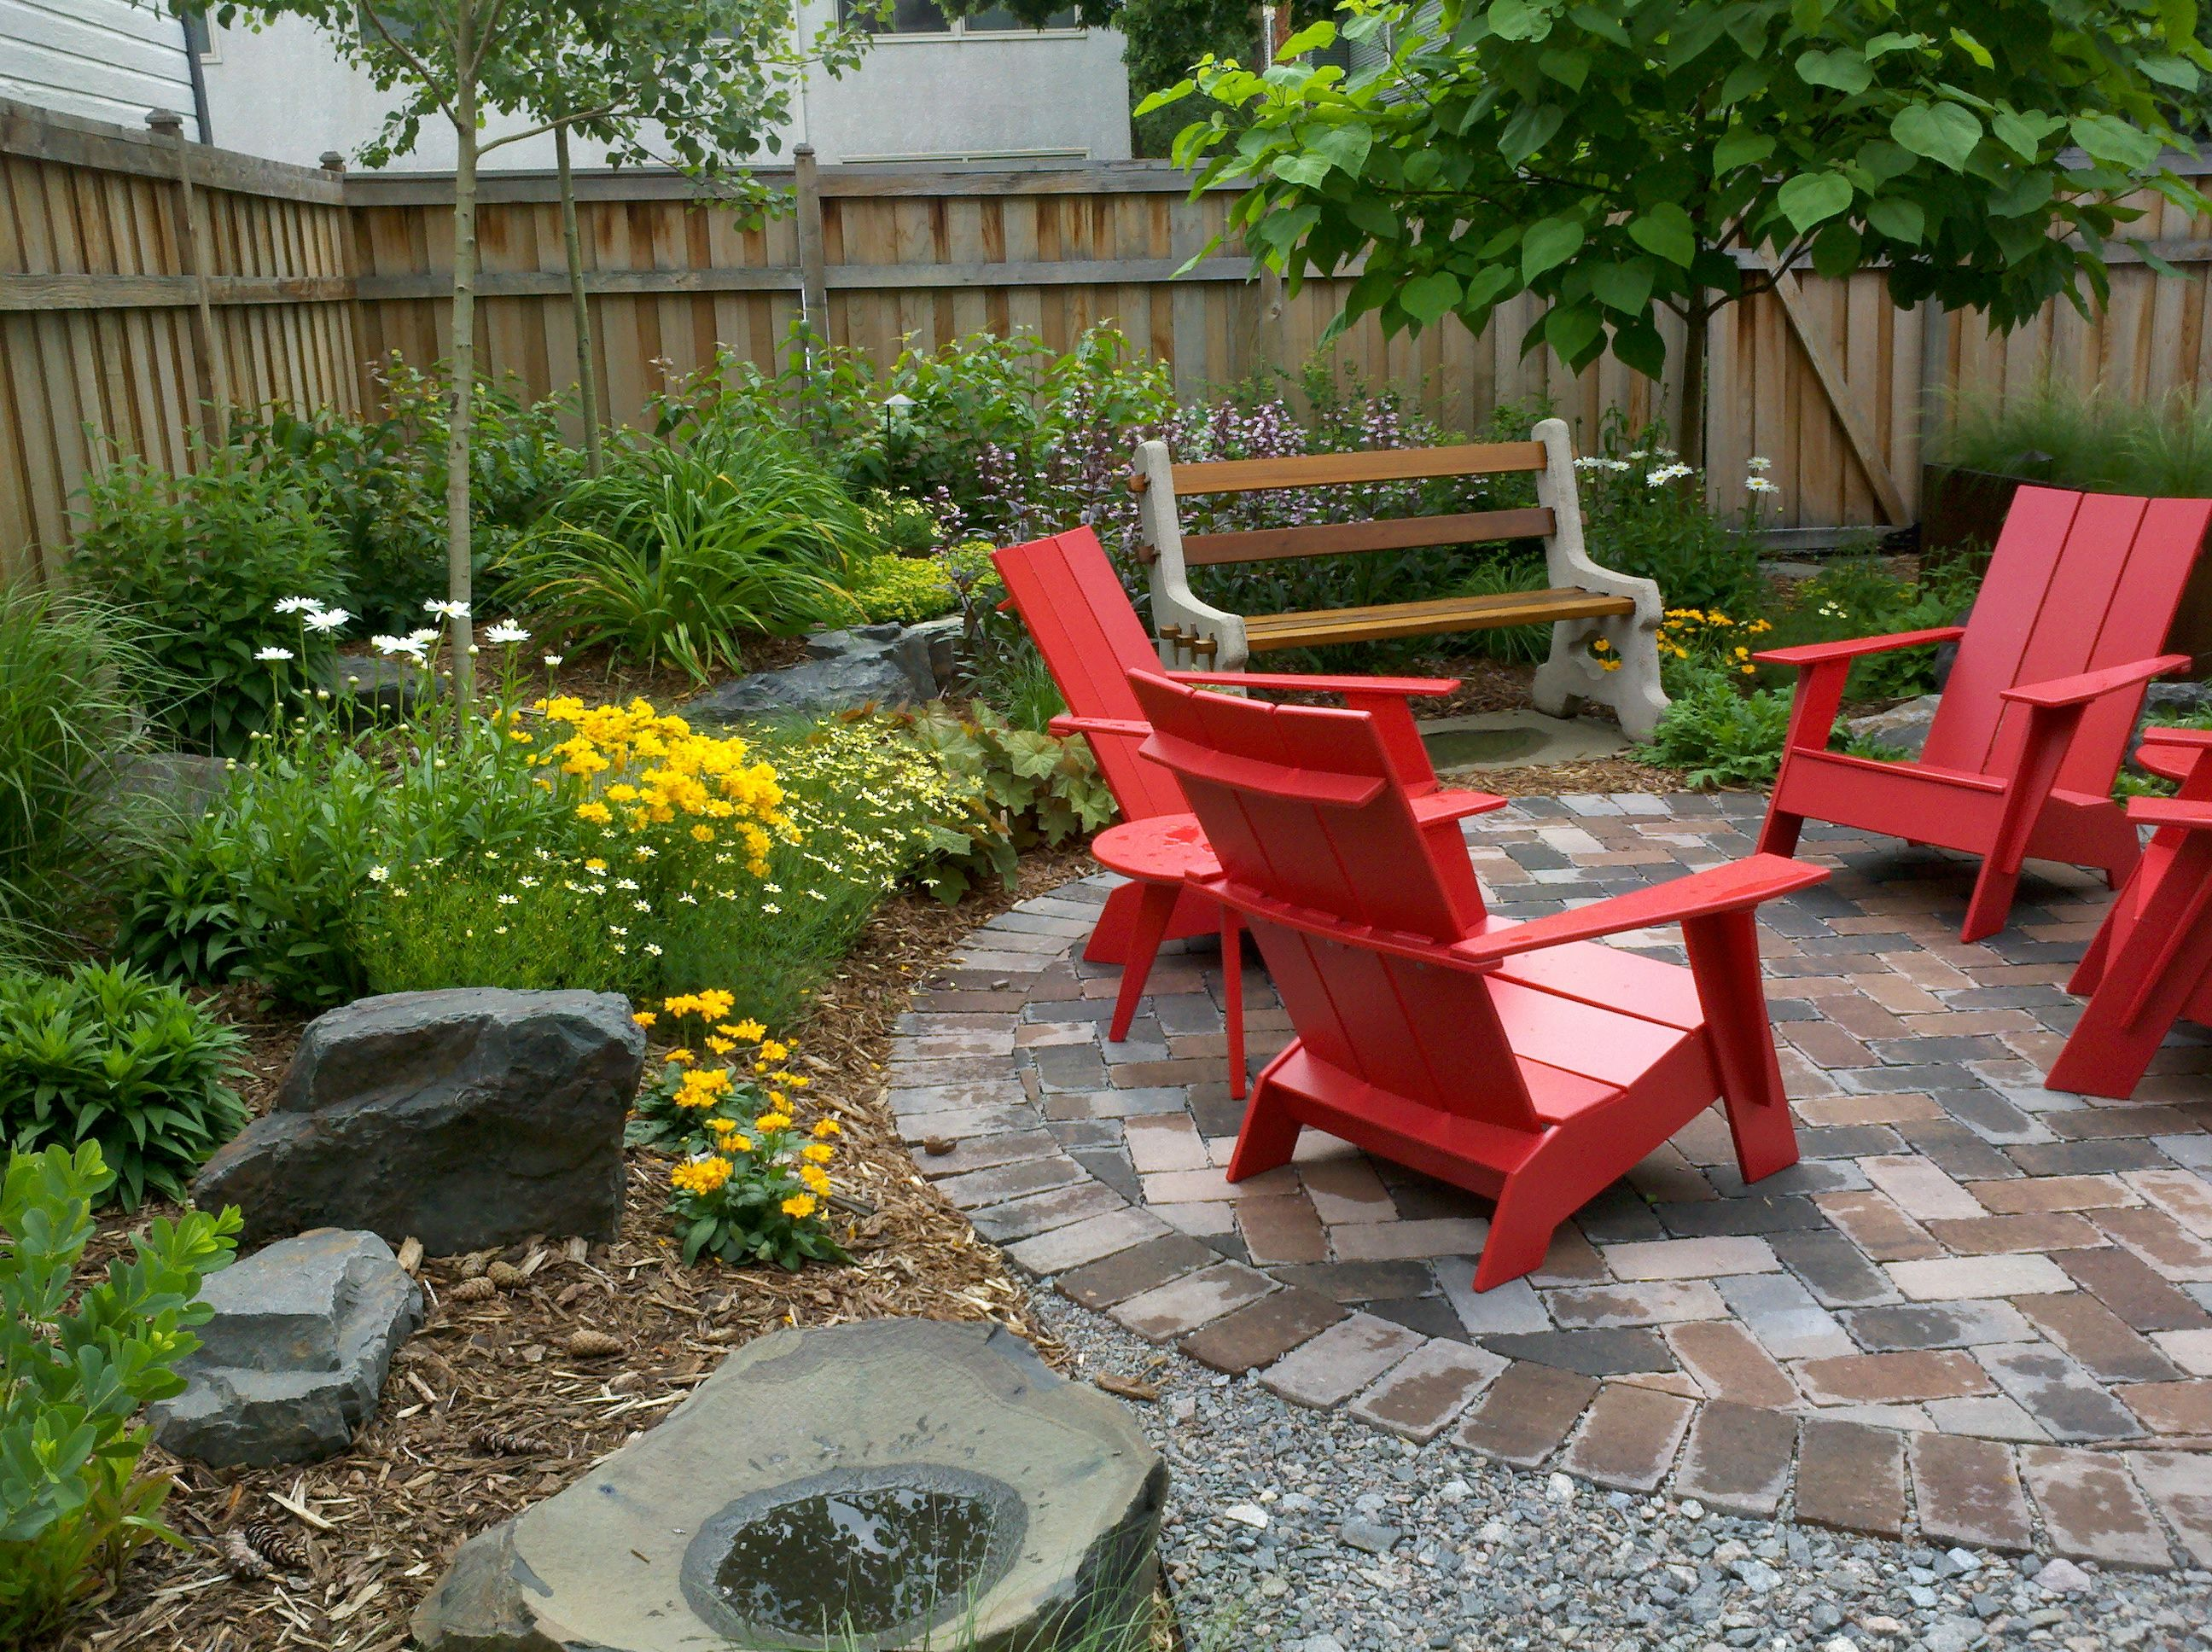 Elegant Landscape Design for Small Spaces